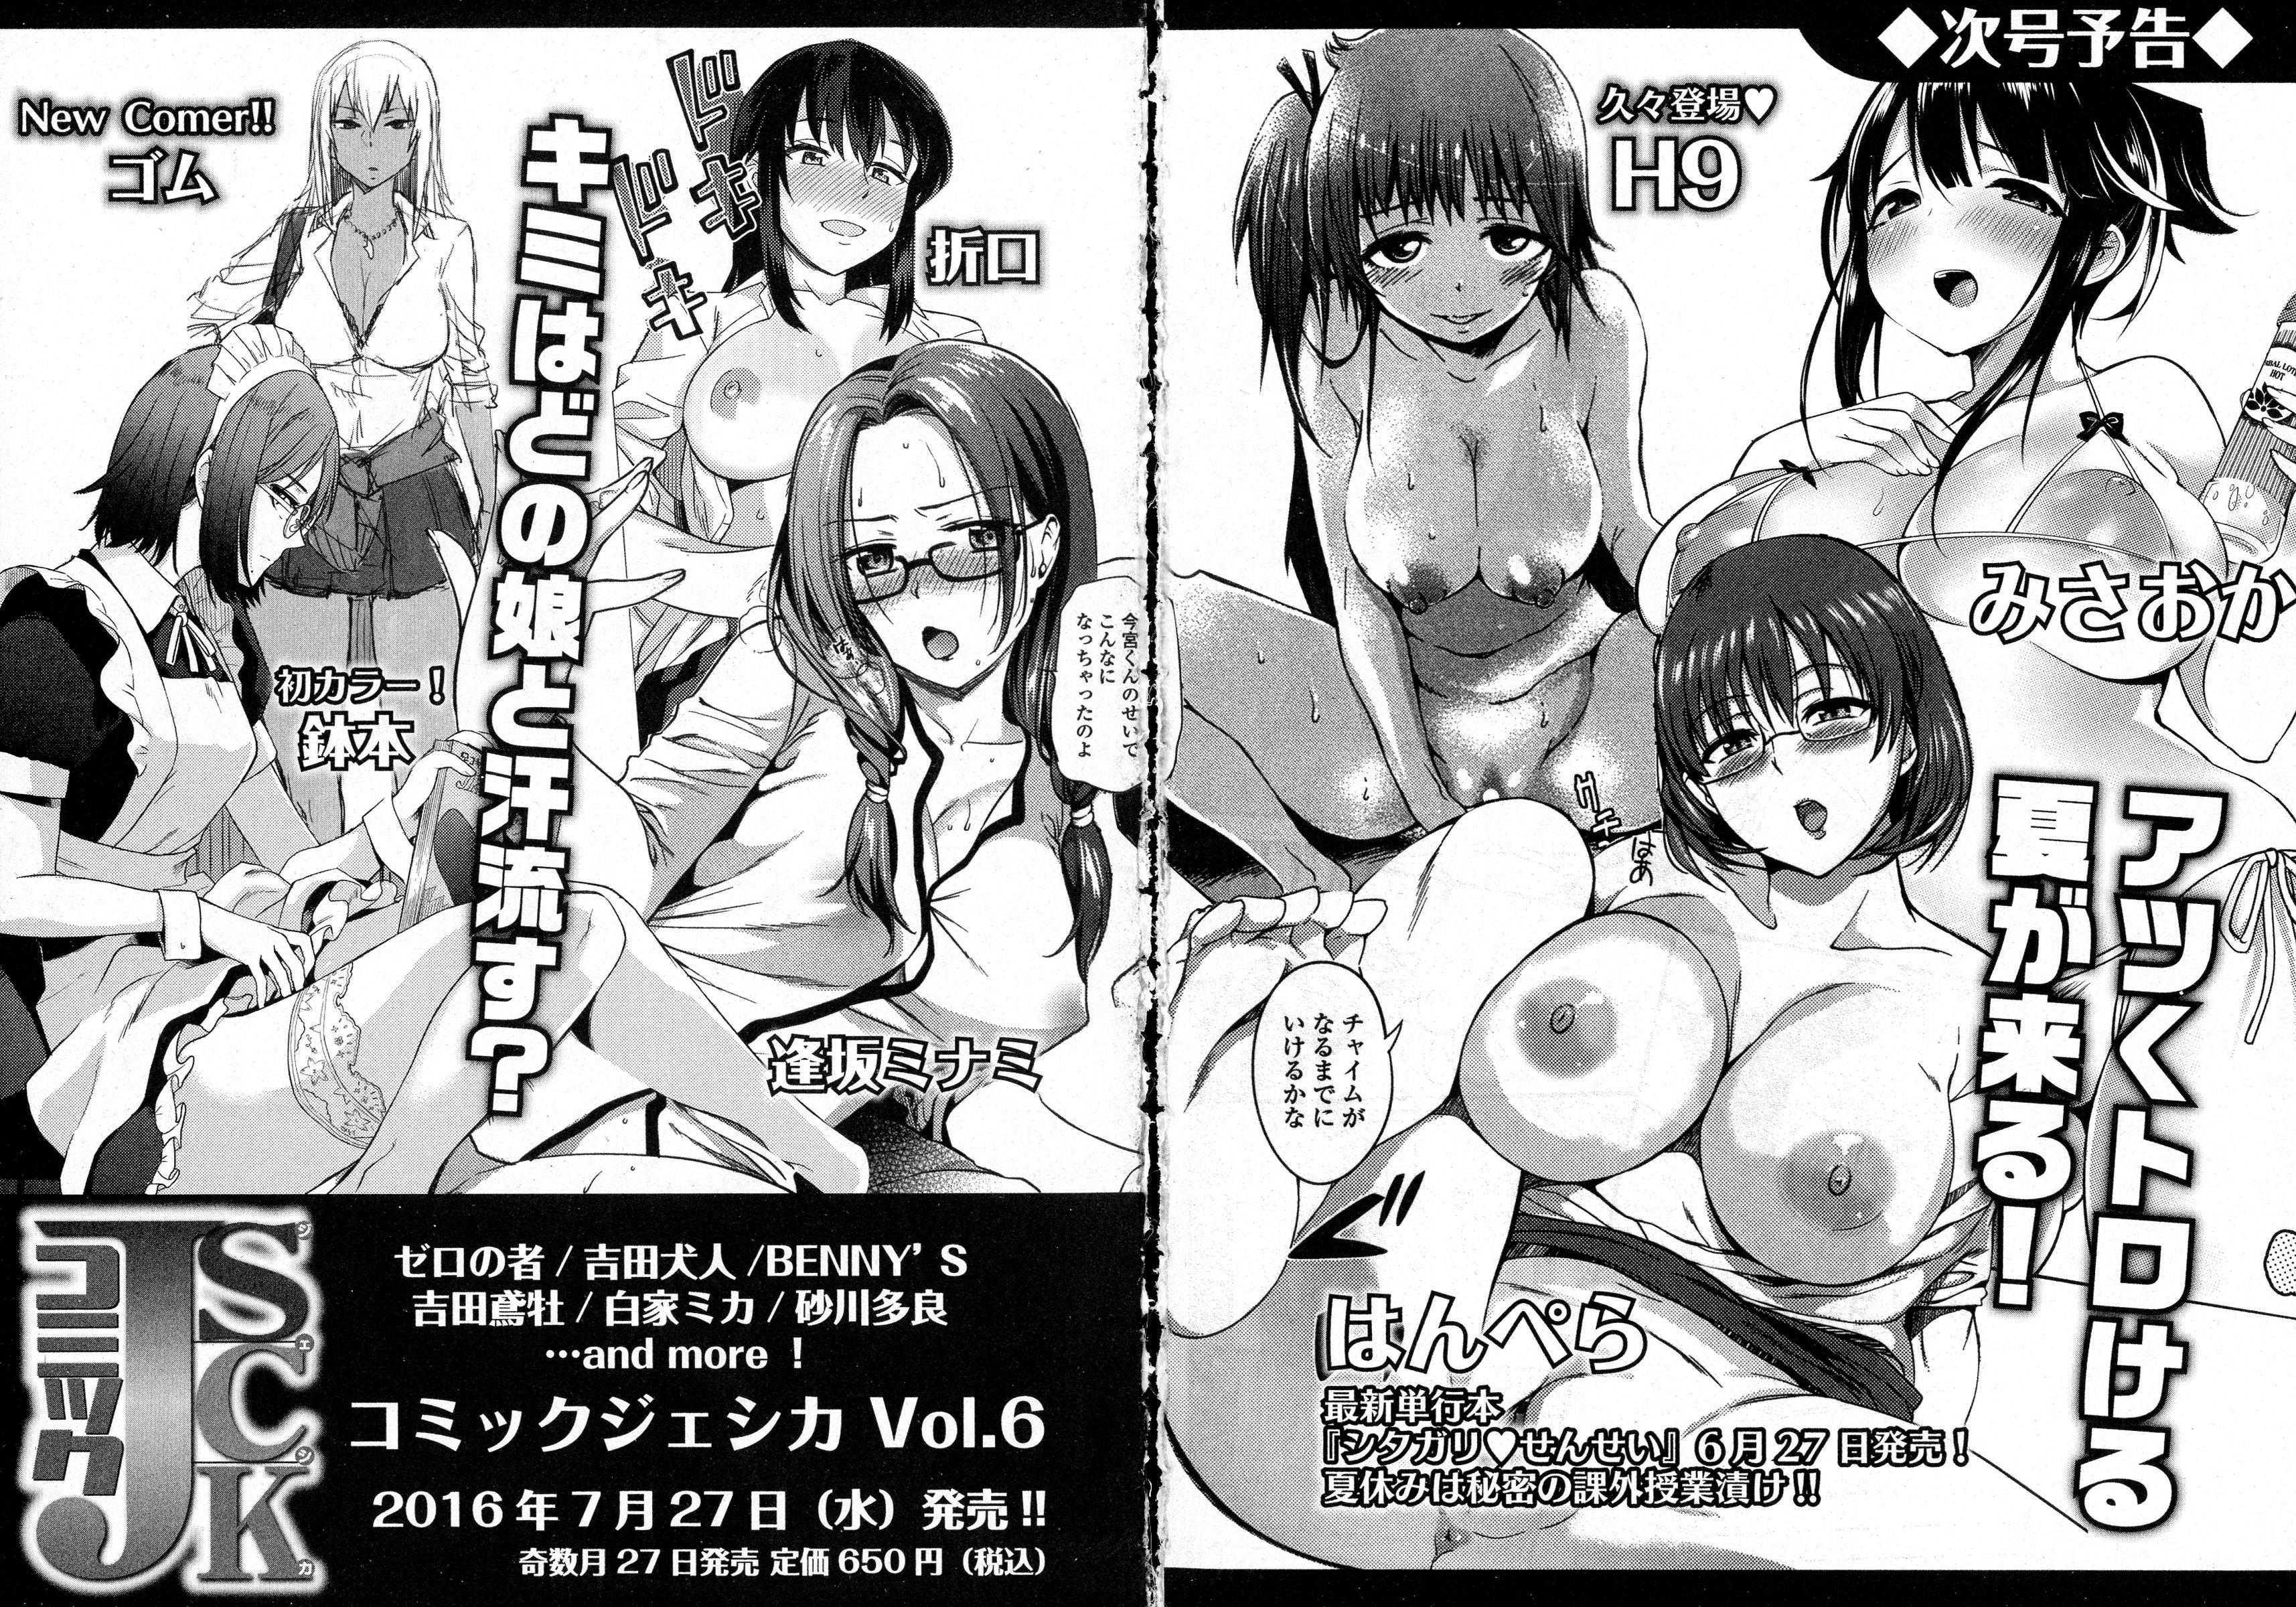 COMIC JSCK Vol. 5 279